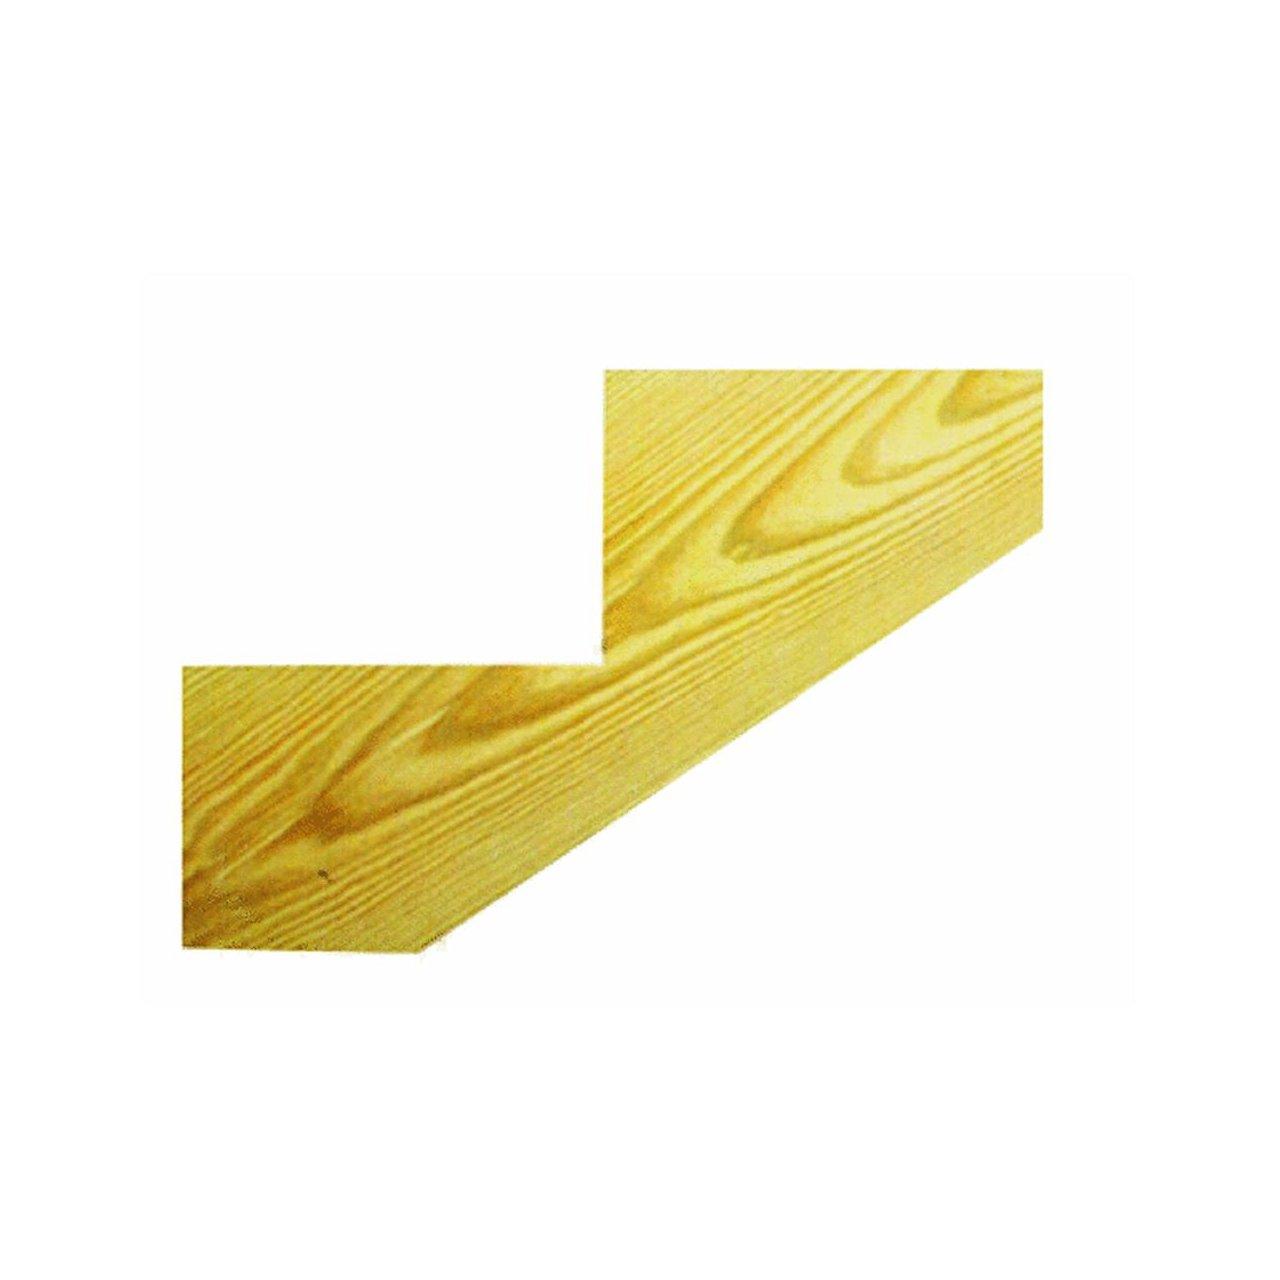 KITZMANS DIXON LLC DB161063 Treated 2-Step Stringer